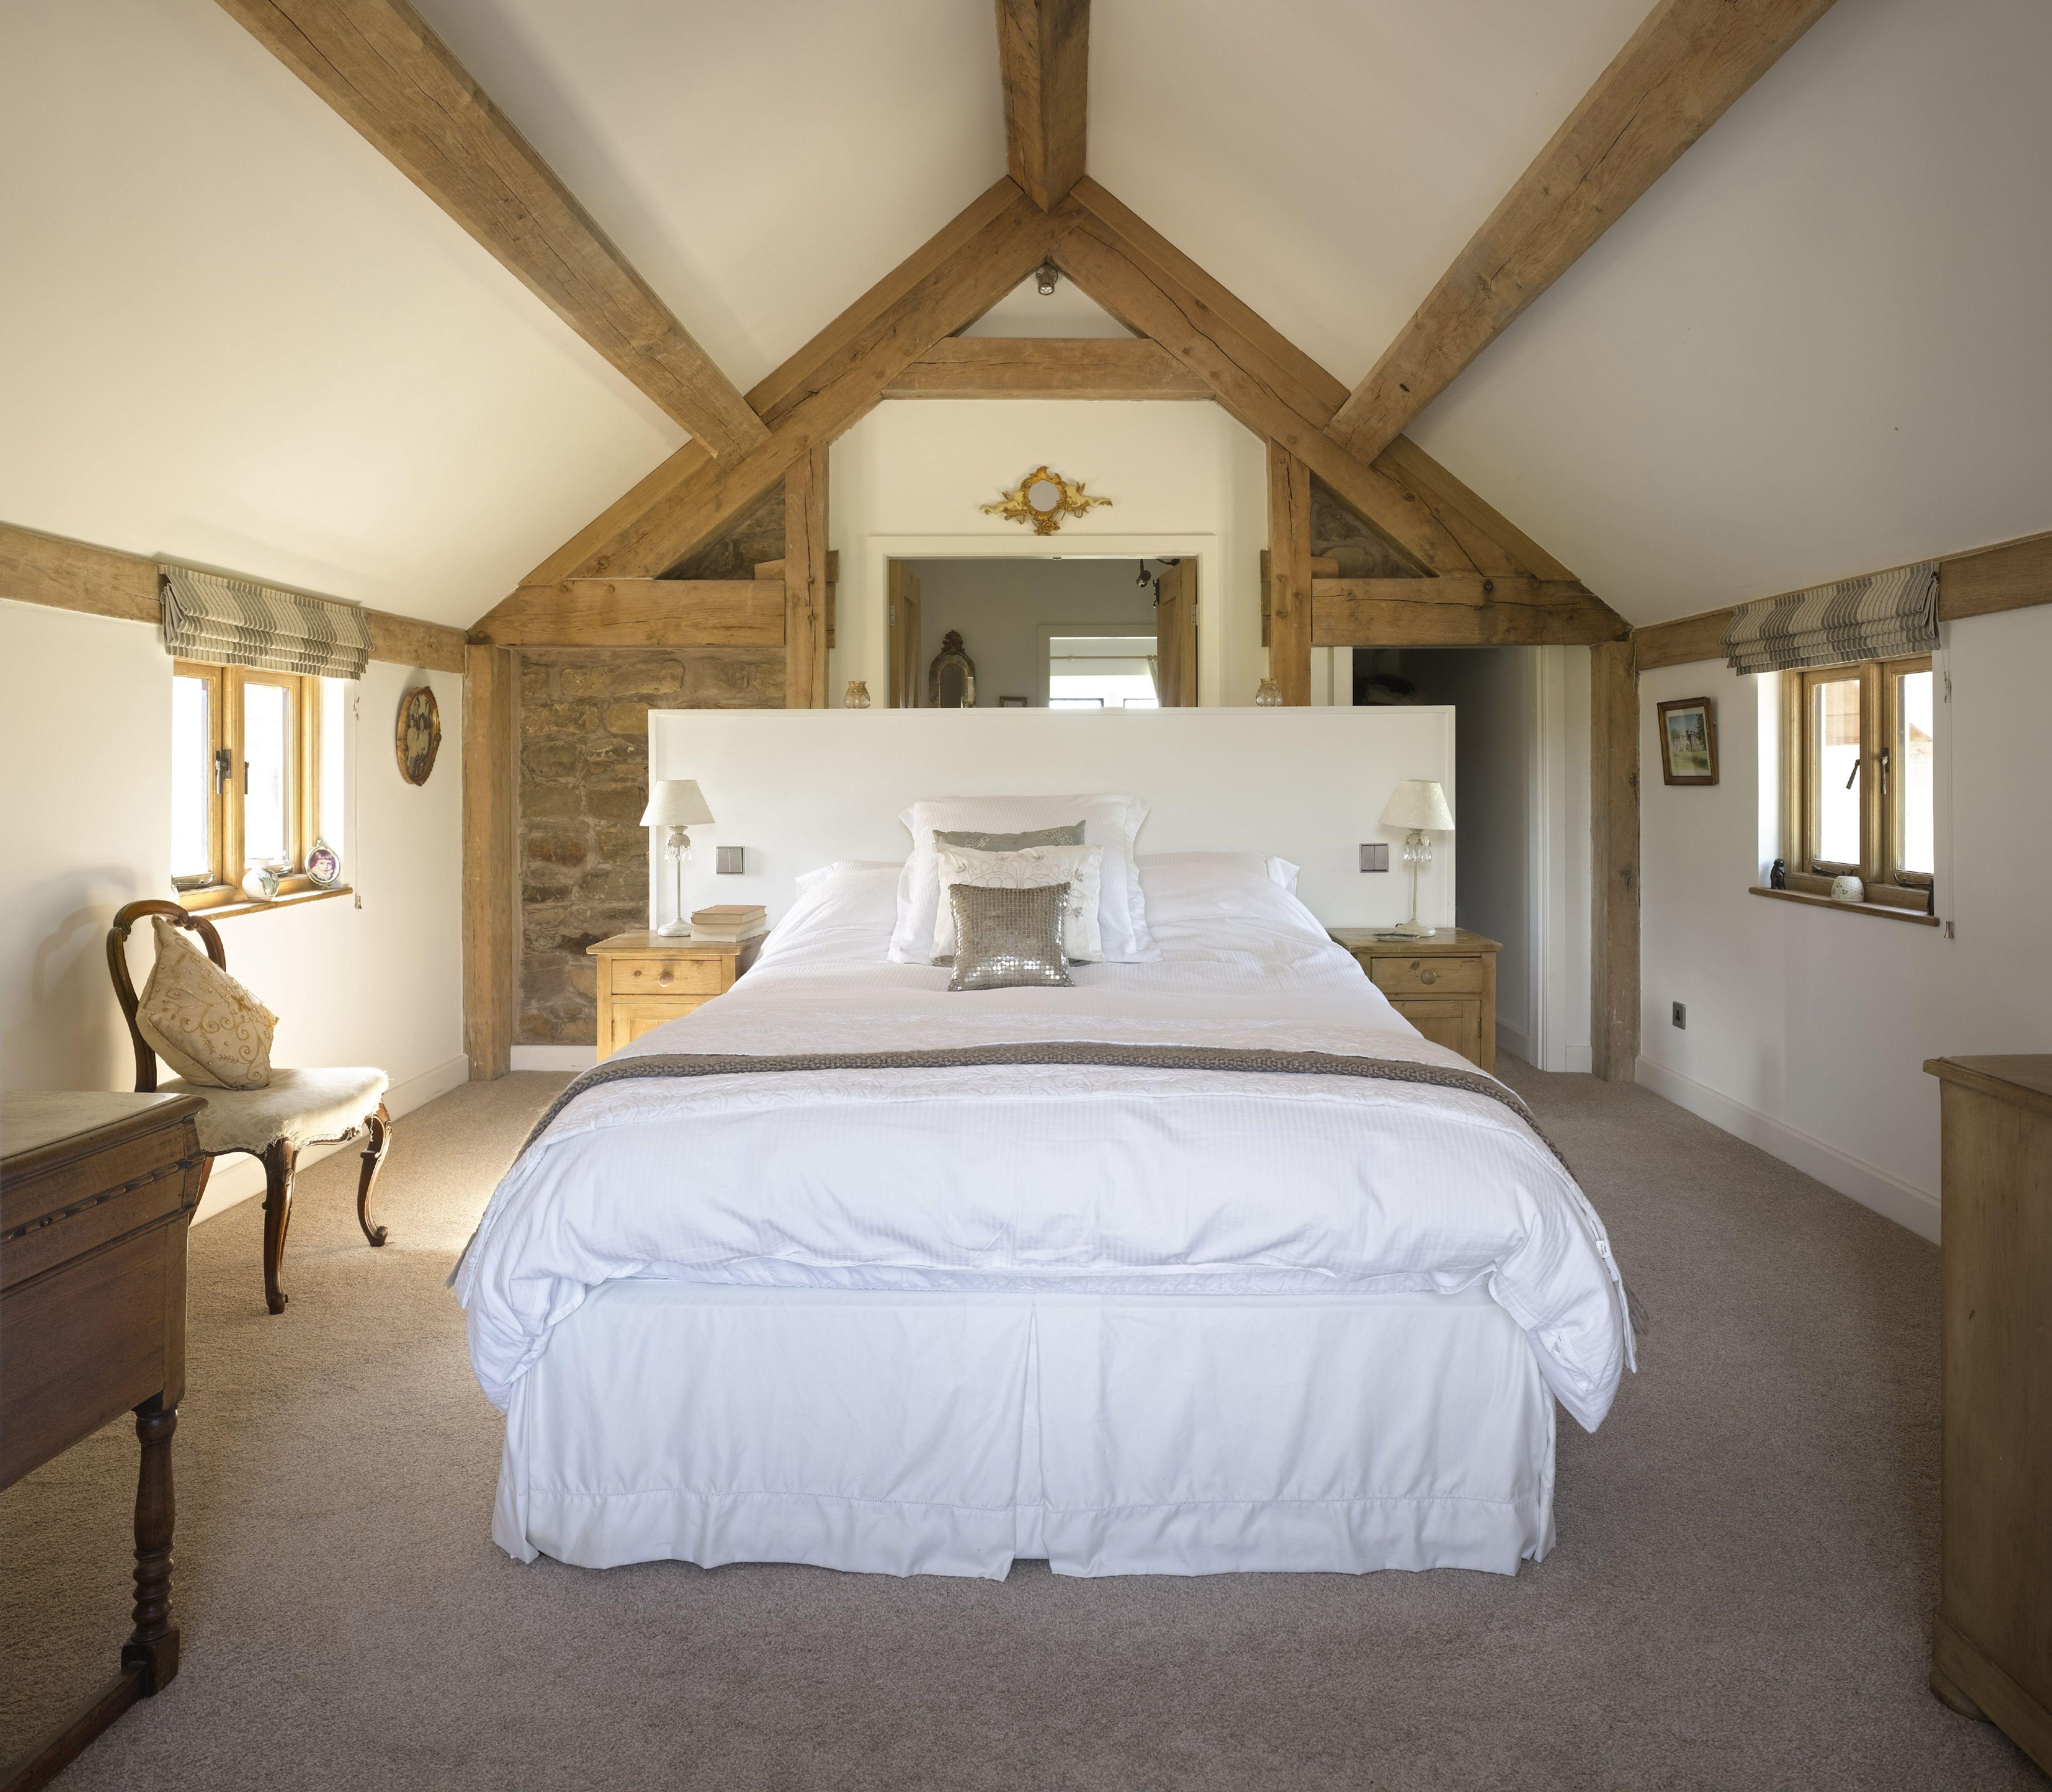 20 Bedroom Designs With Vaulted Ceilings: Border Oak - Oak Vaulted Ceiling